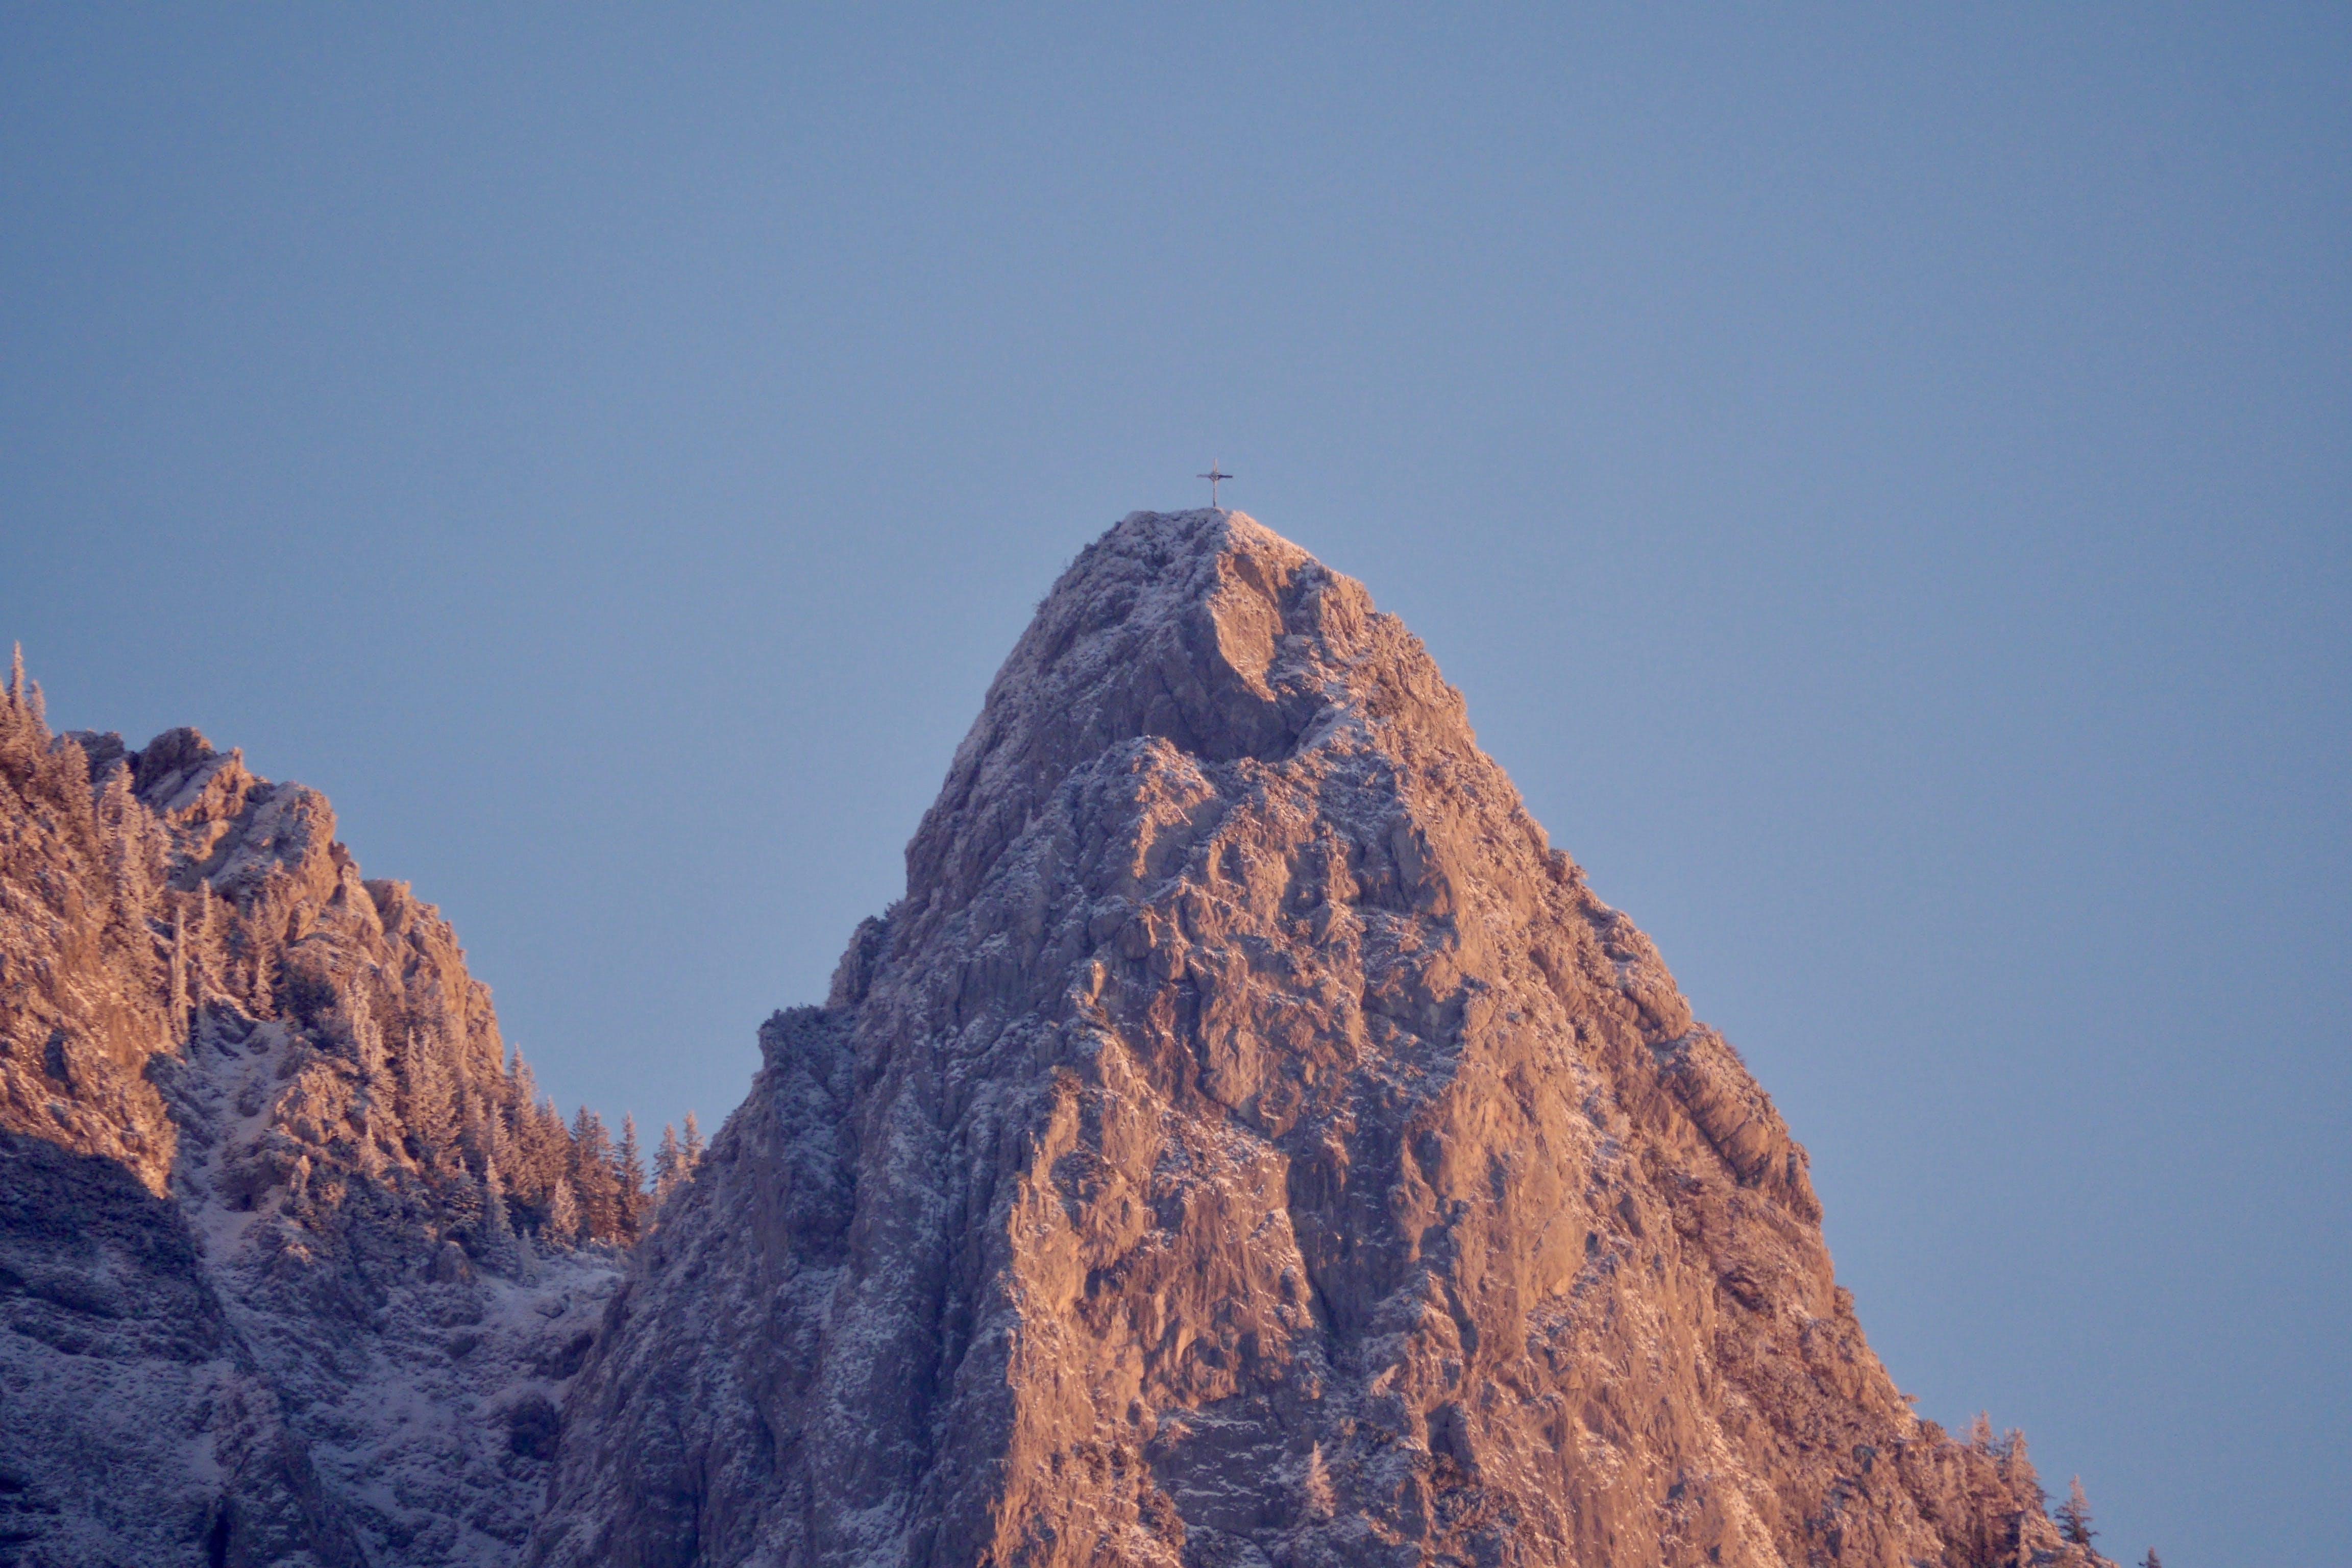 Kostenloses Stock Foto zu berg, berggipfel, gebirge, gipfel